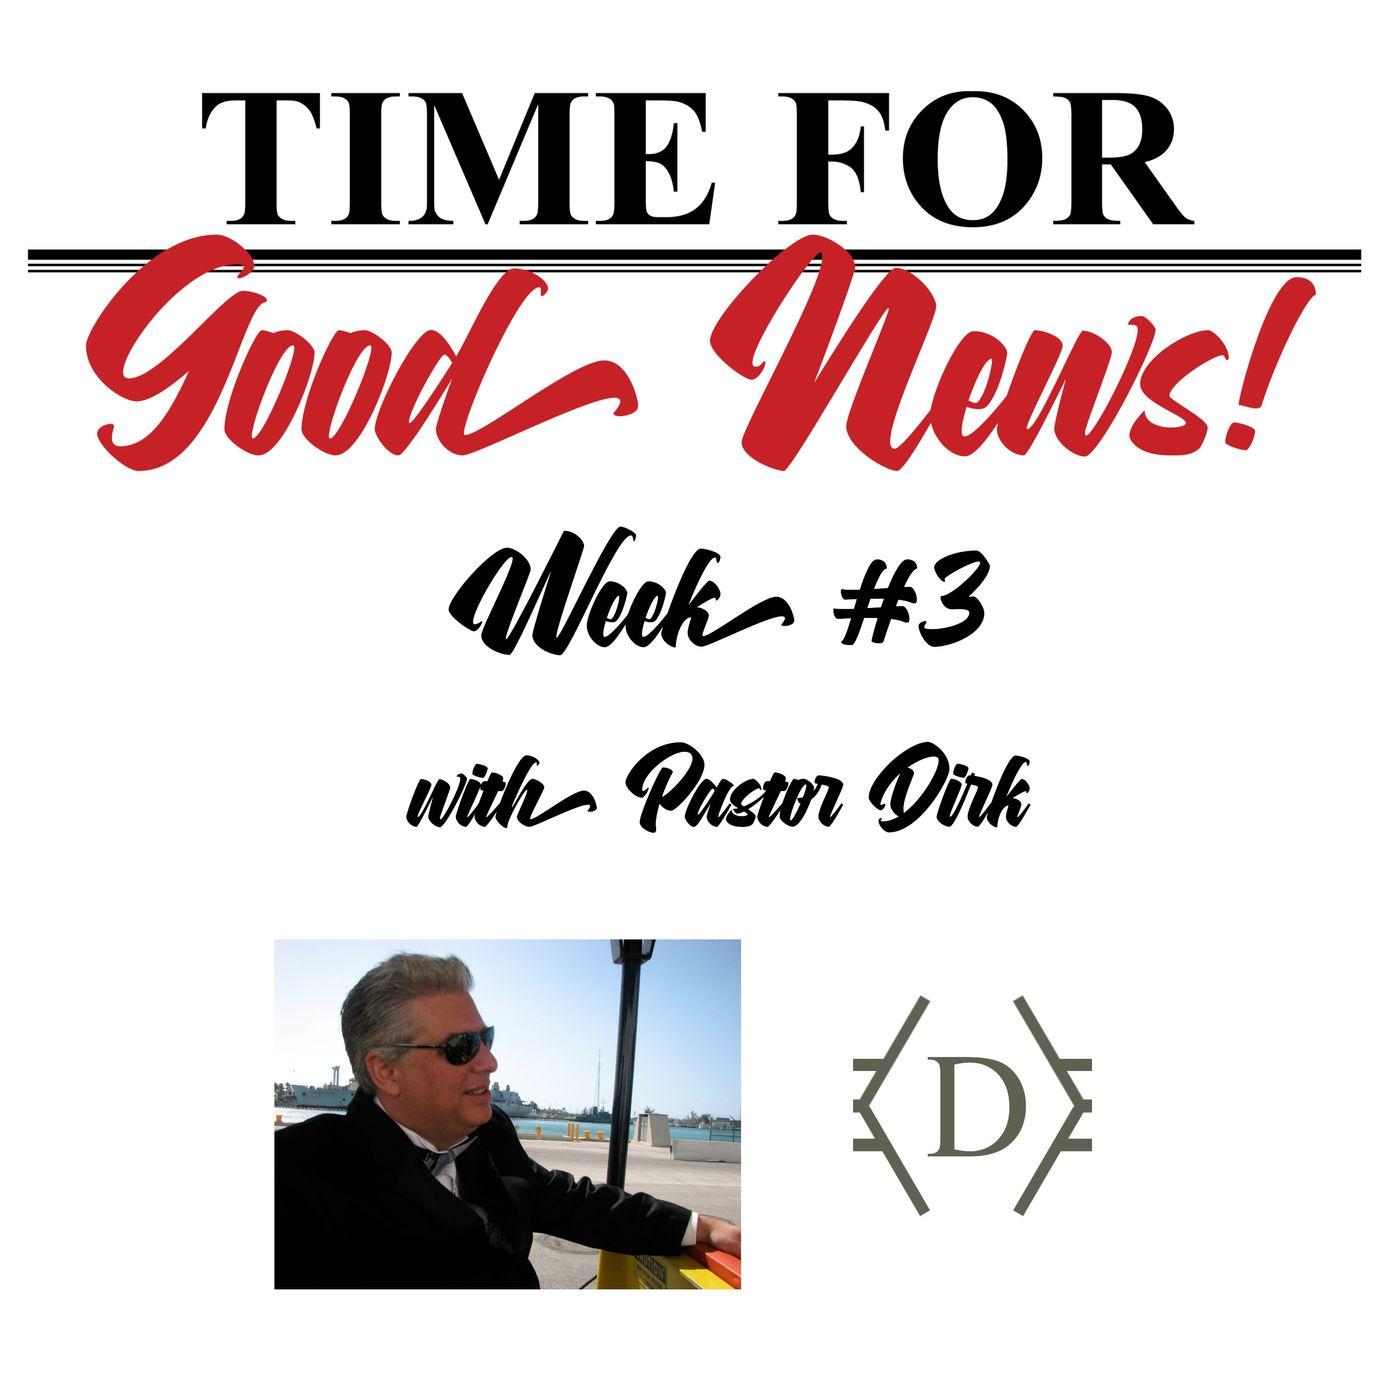 Time for Good News - Week 3: A New Healer, November 22, 2020